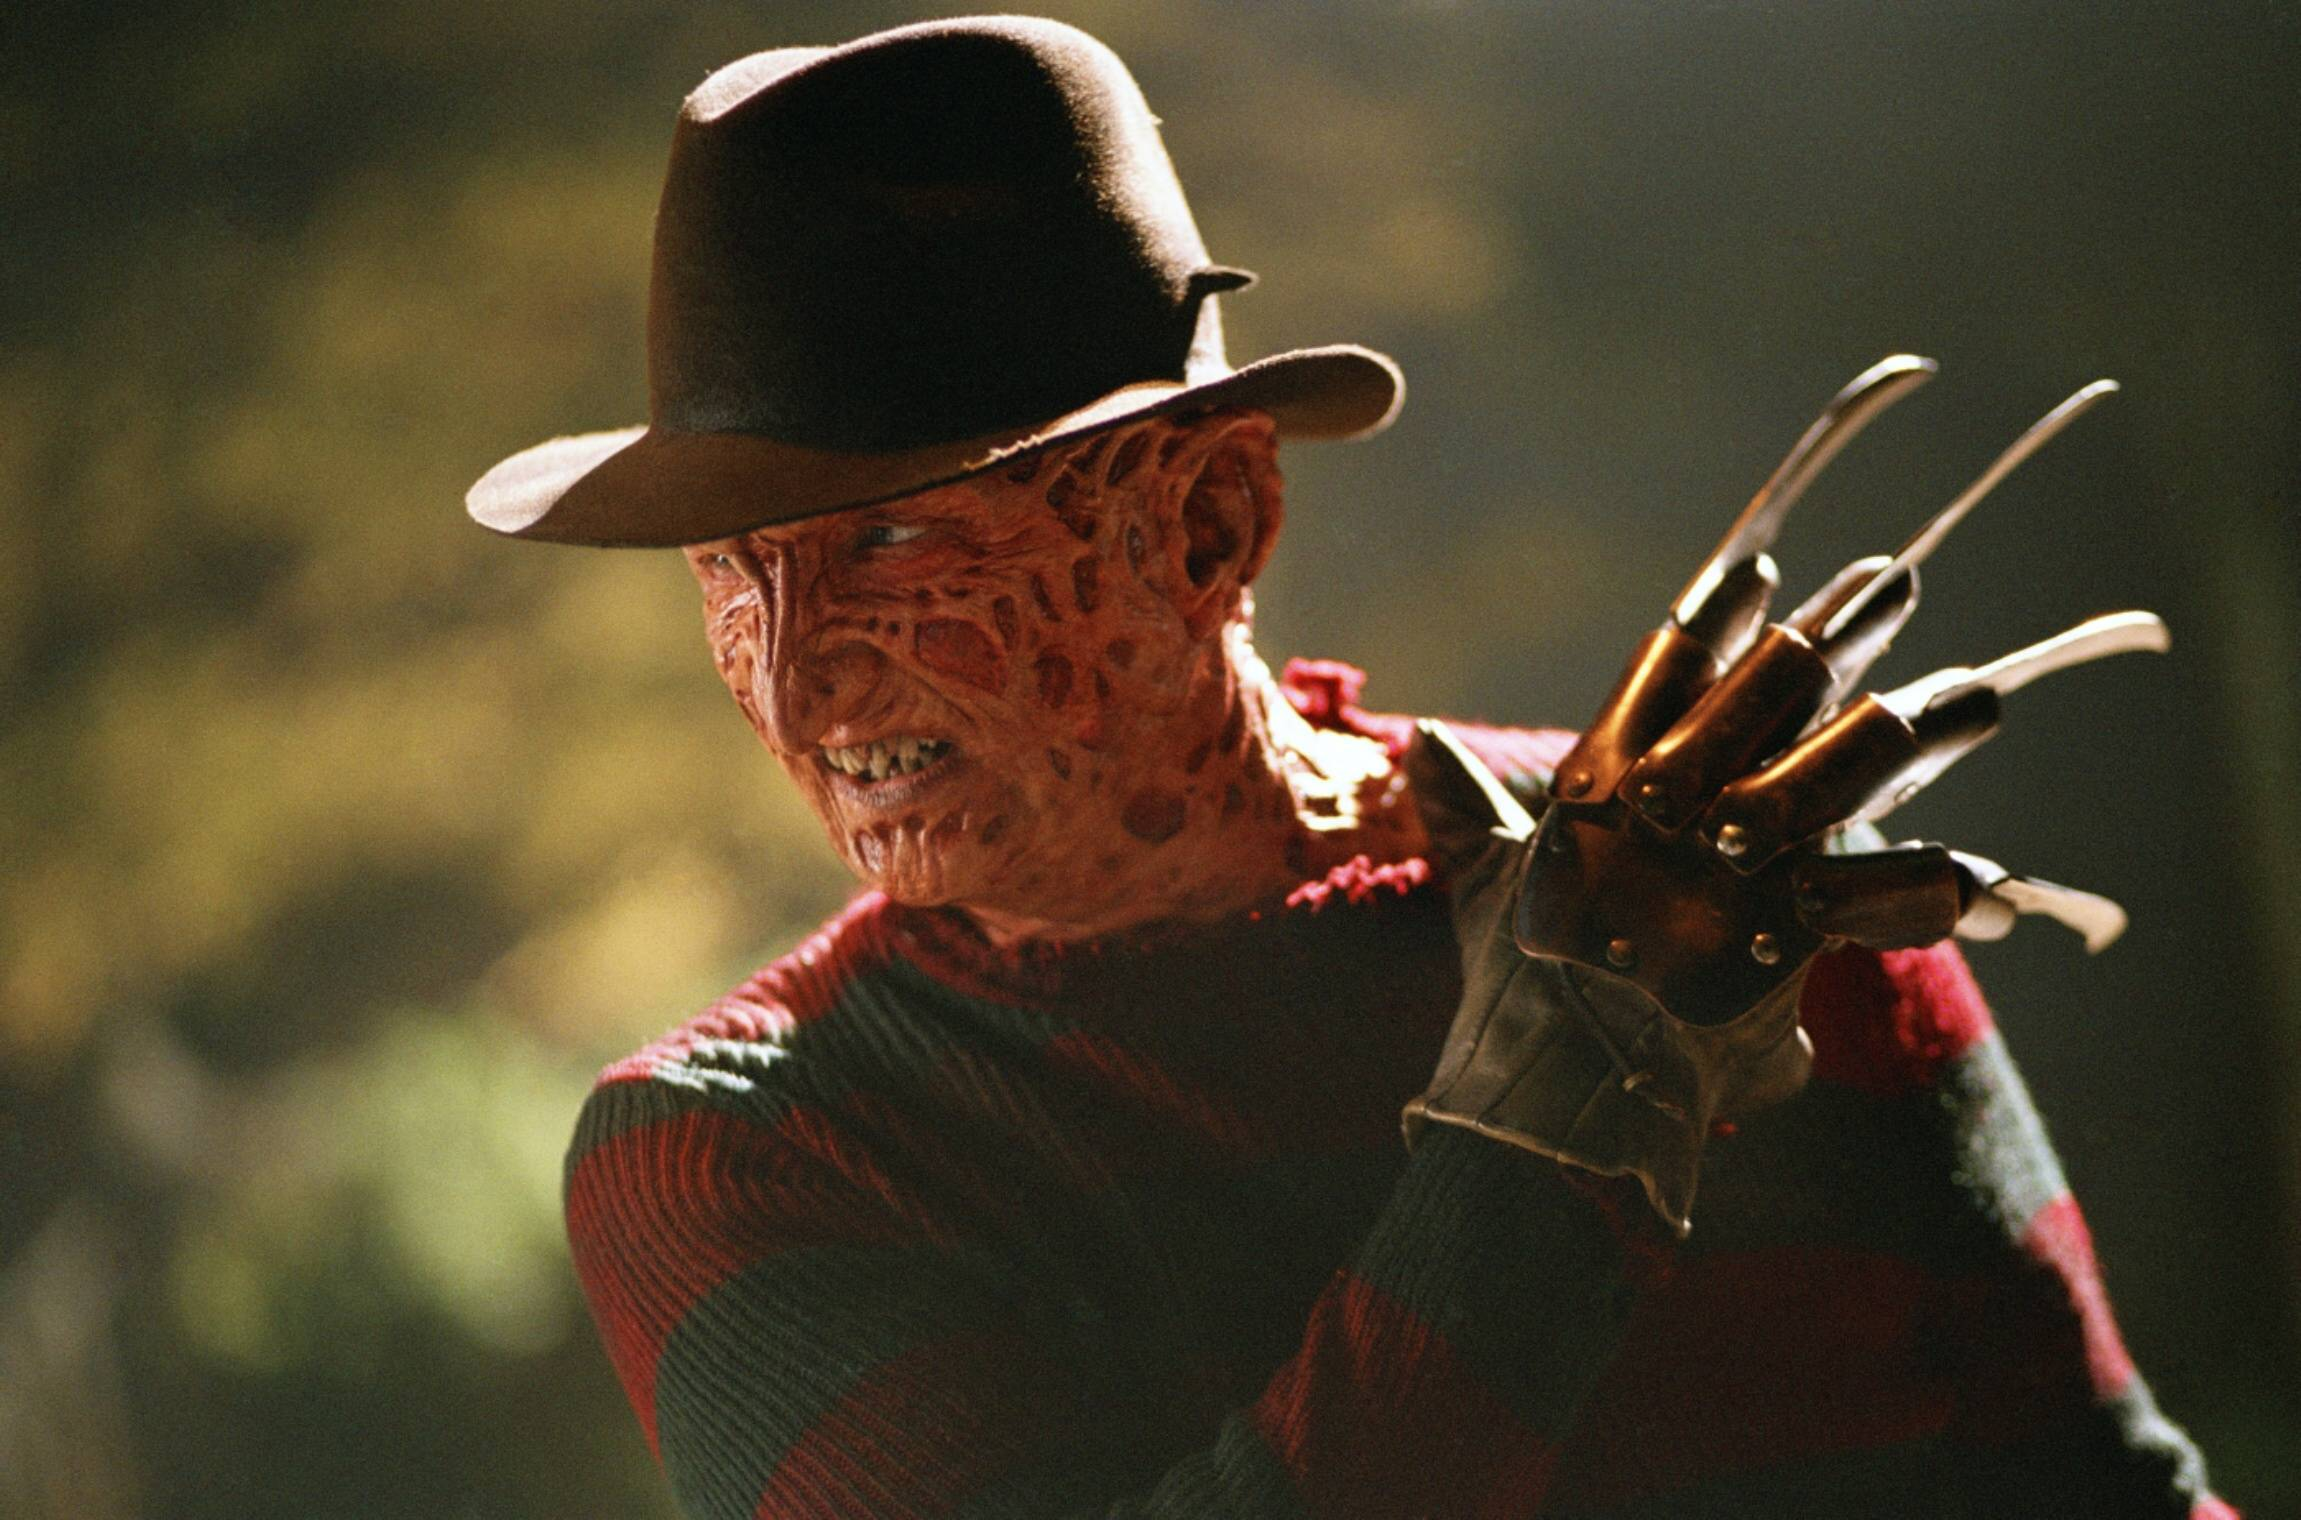 freddy krueger,a nightmare on elmstreet, udklædning, klæd ud, halloween, halloween kostume, skræmmende, creepy, uhygge, uhyggeligt